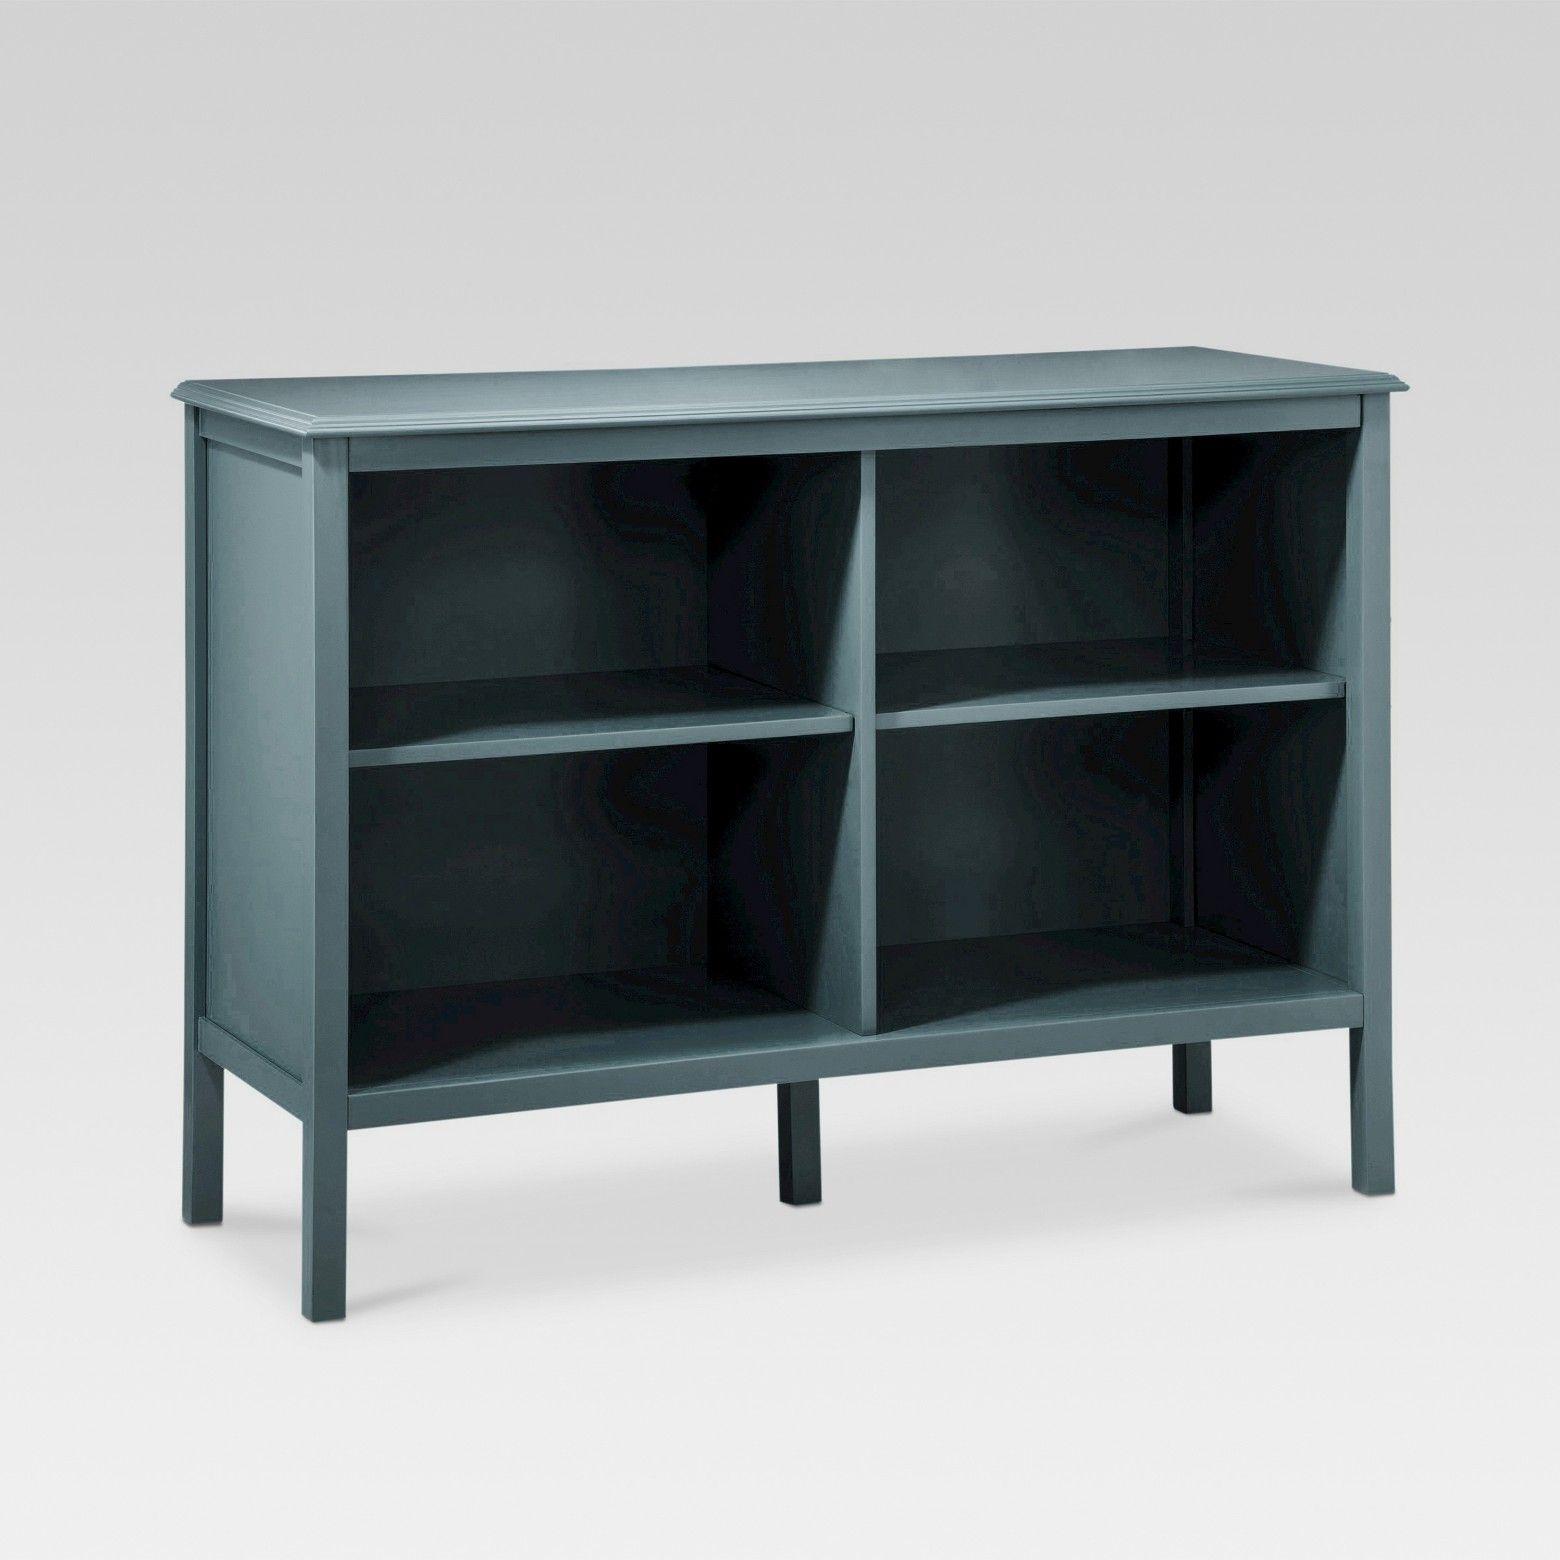 furniture bookcase cream solution horizontal best storage abstract decor